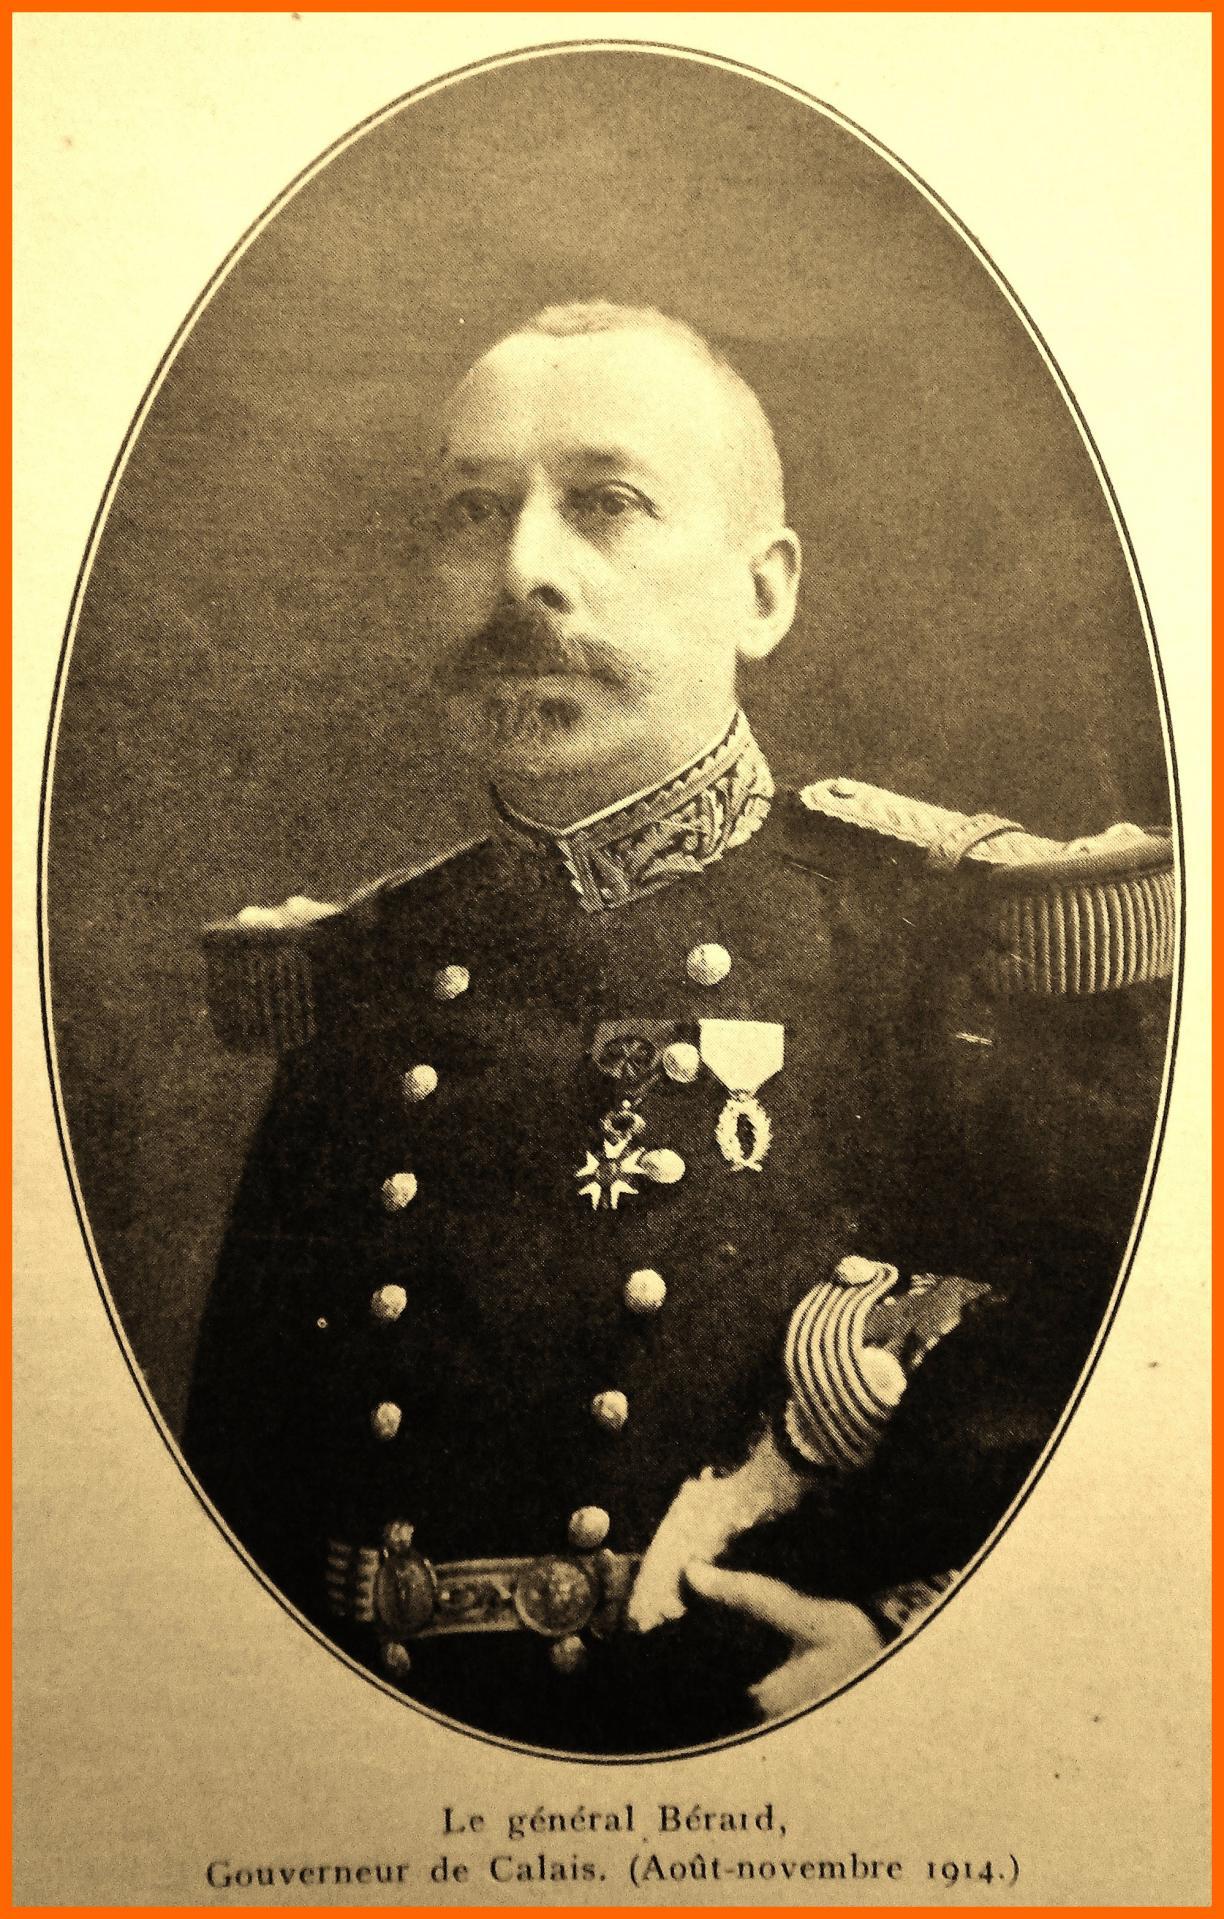 Calais 14 18 le general berard gouverneur de calais d aout a novembre 1914 encadre